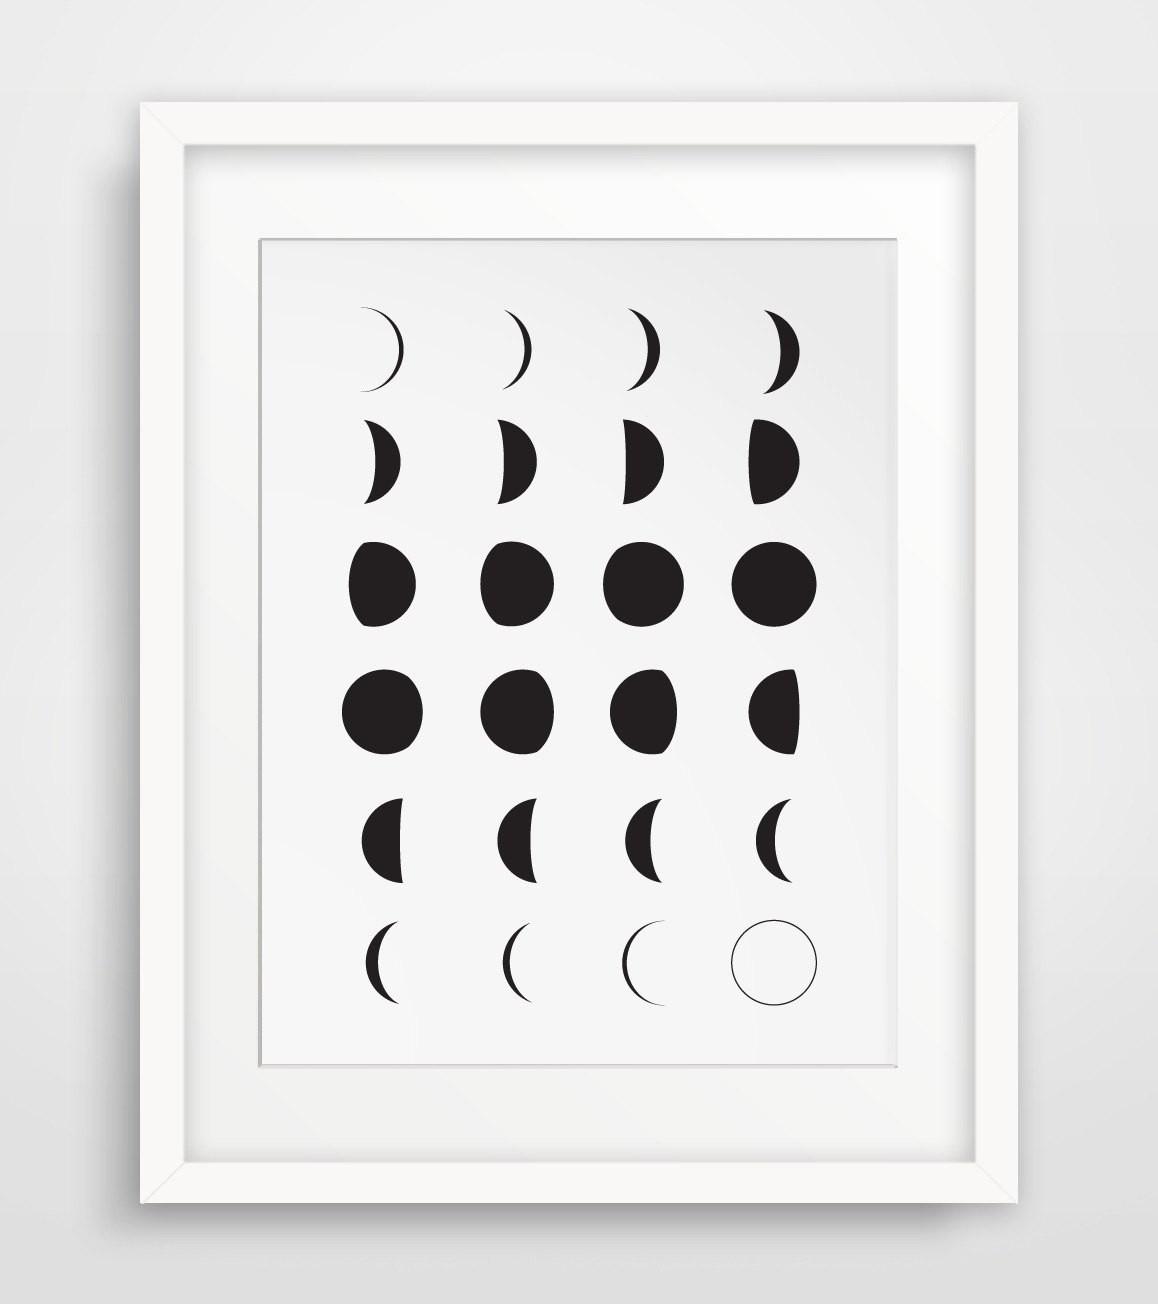 Free Printable Wall Art Black And White - Breatheagain - Free Printable Wall Art Black And White